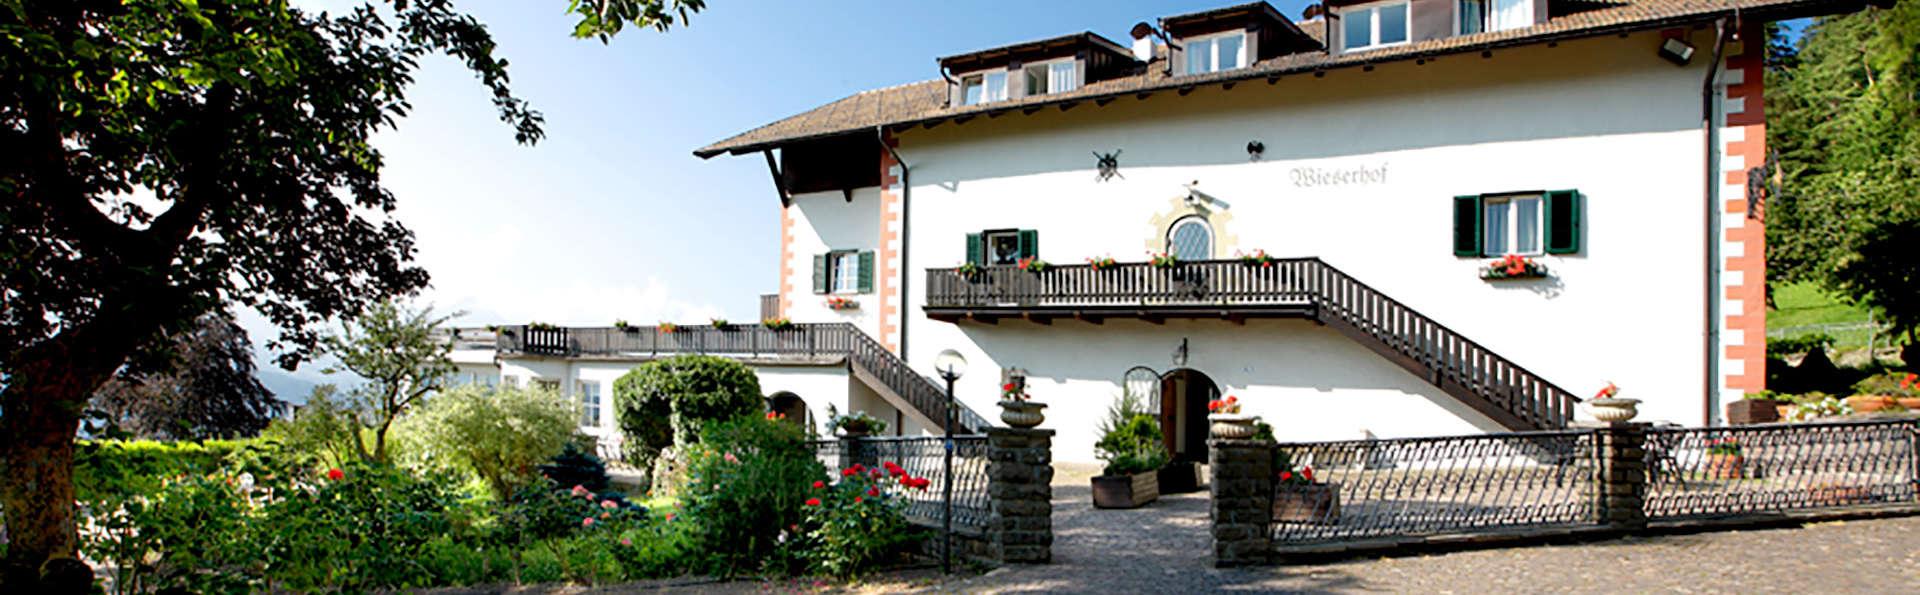 Naturhotel Wieserhof - Edit_Front3.jpg